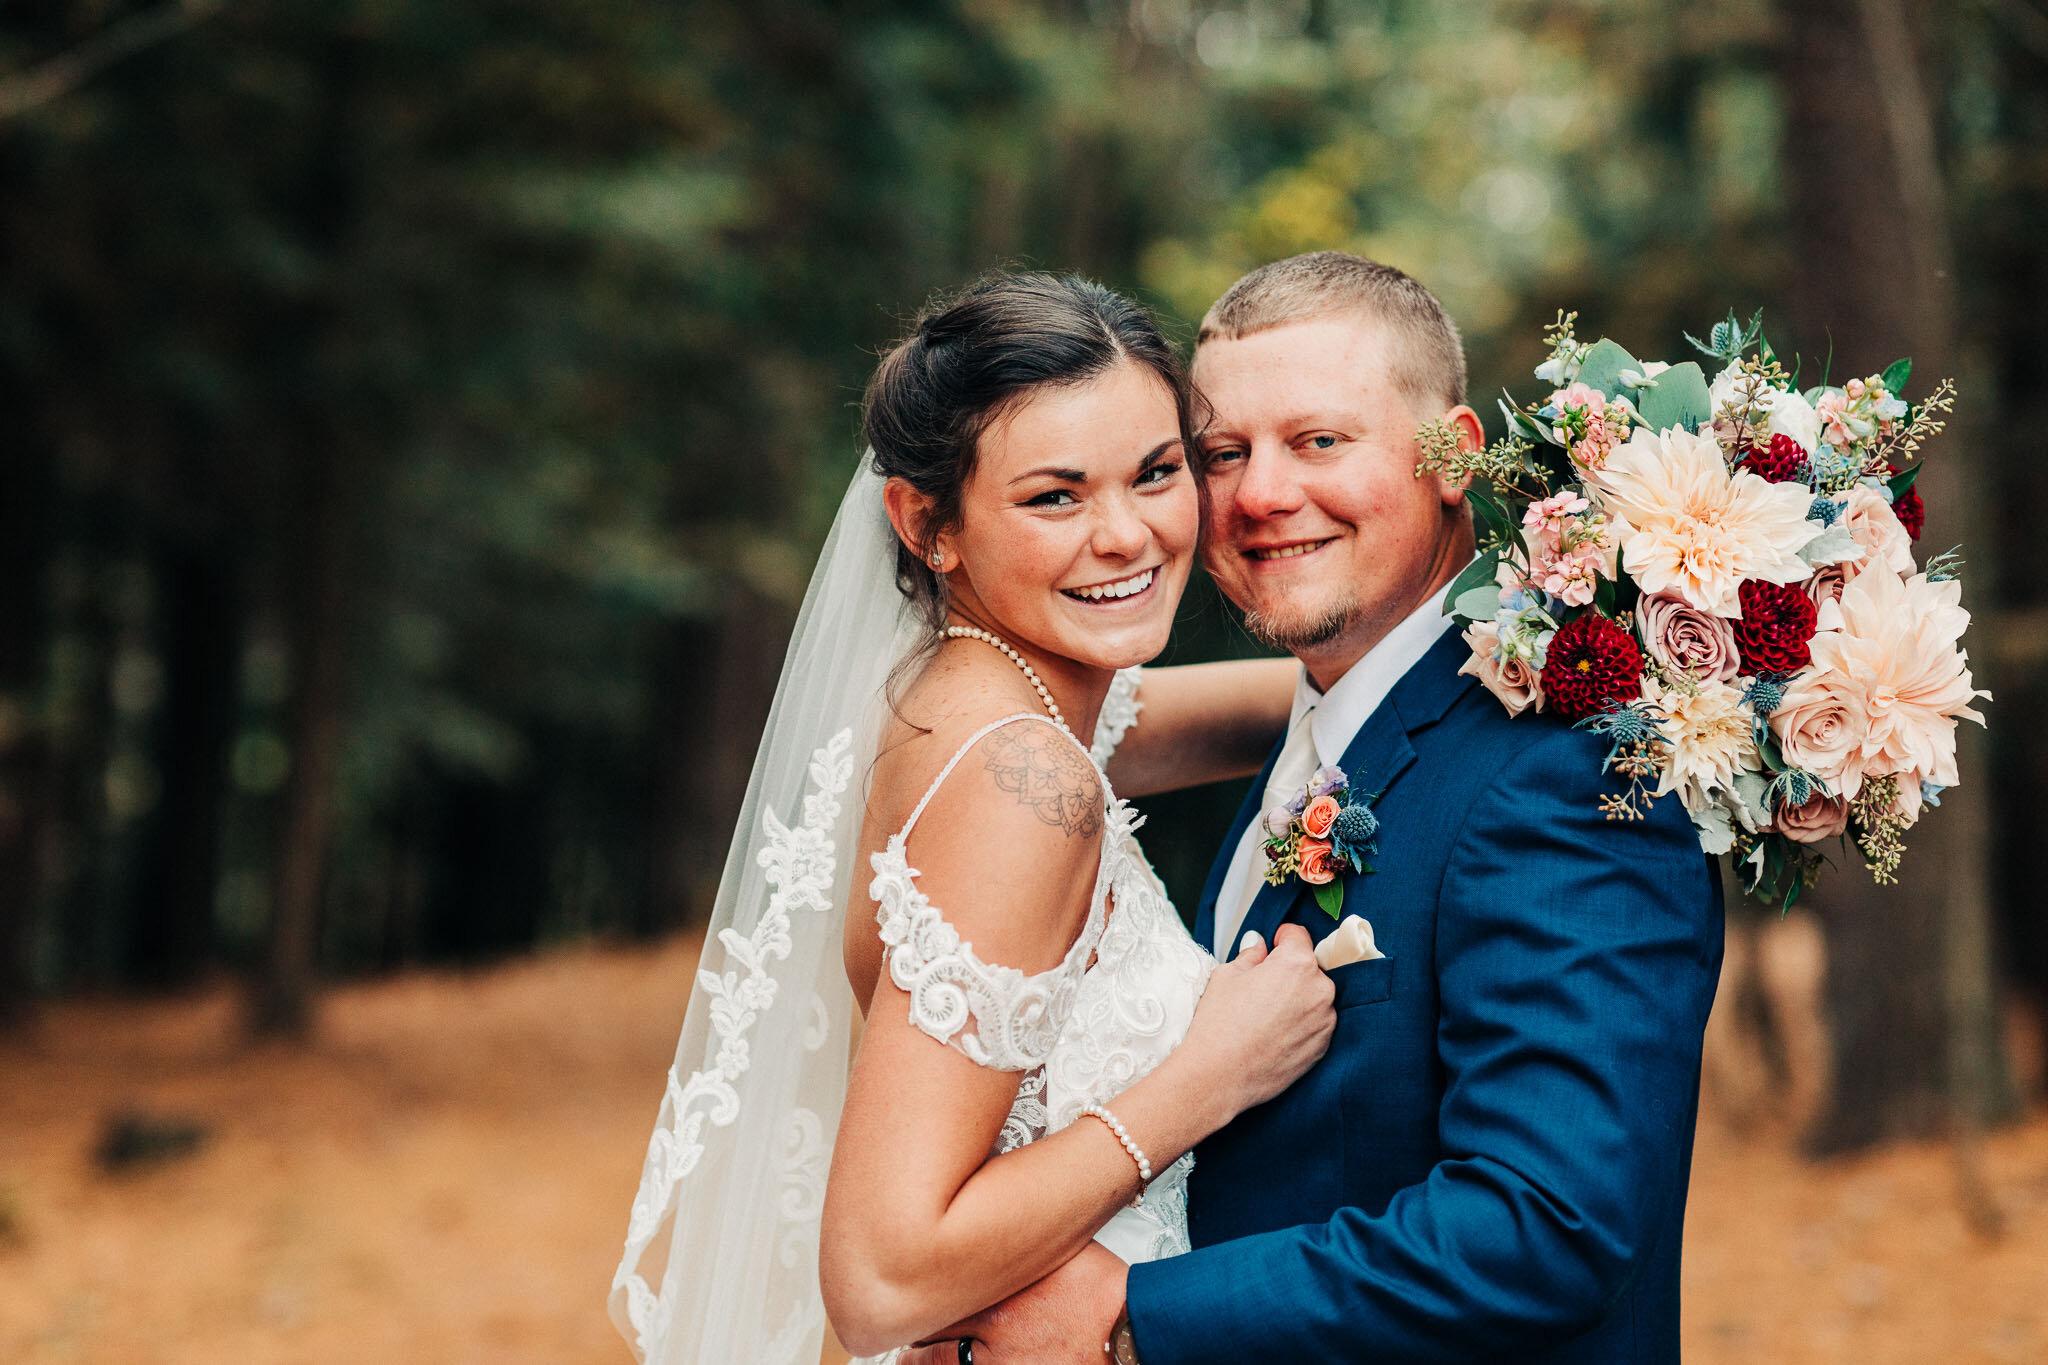 whitewoods-fall-wedding-2479.jpg